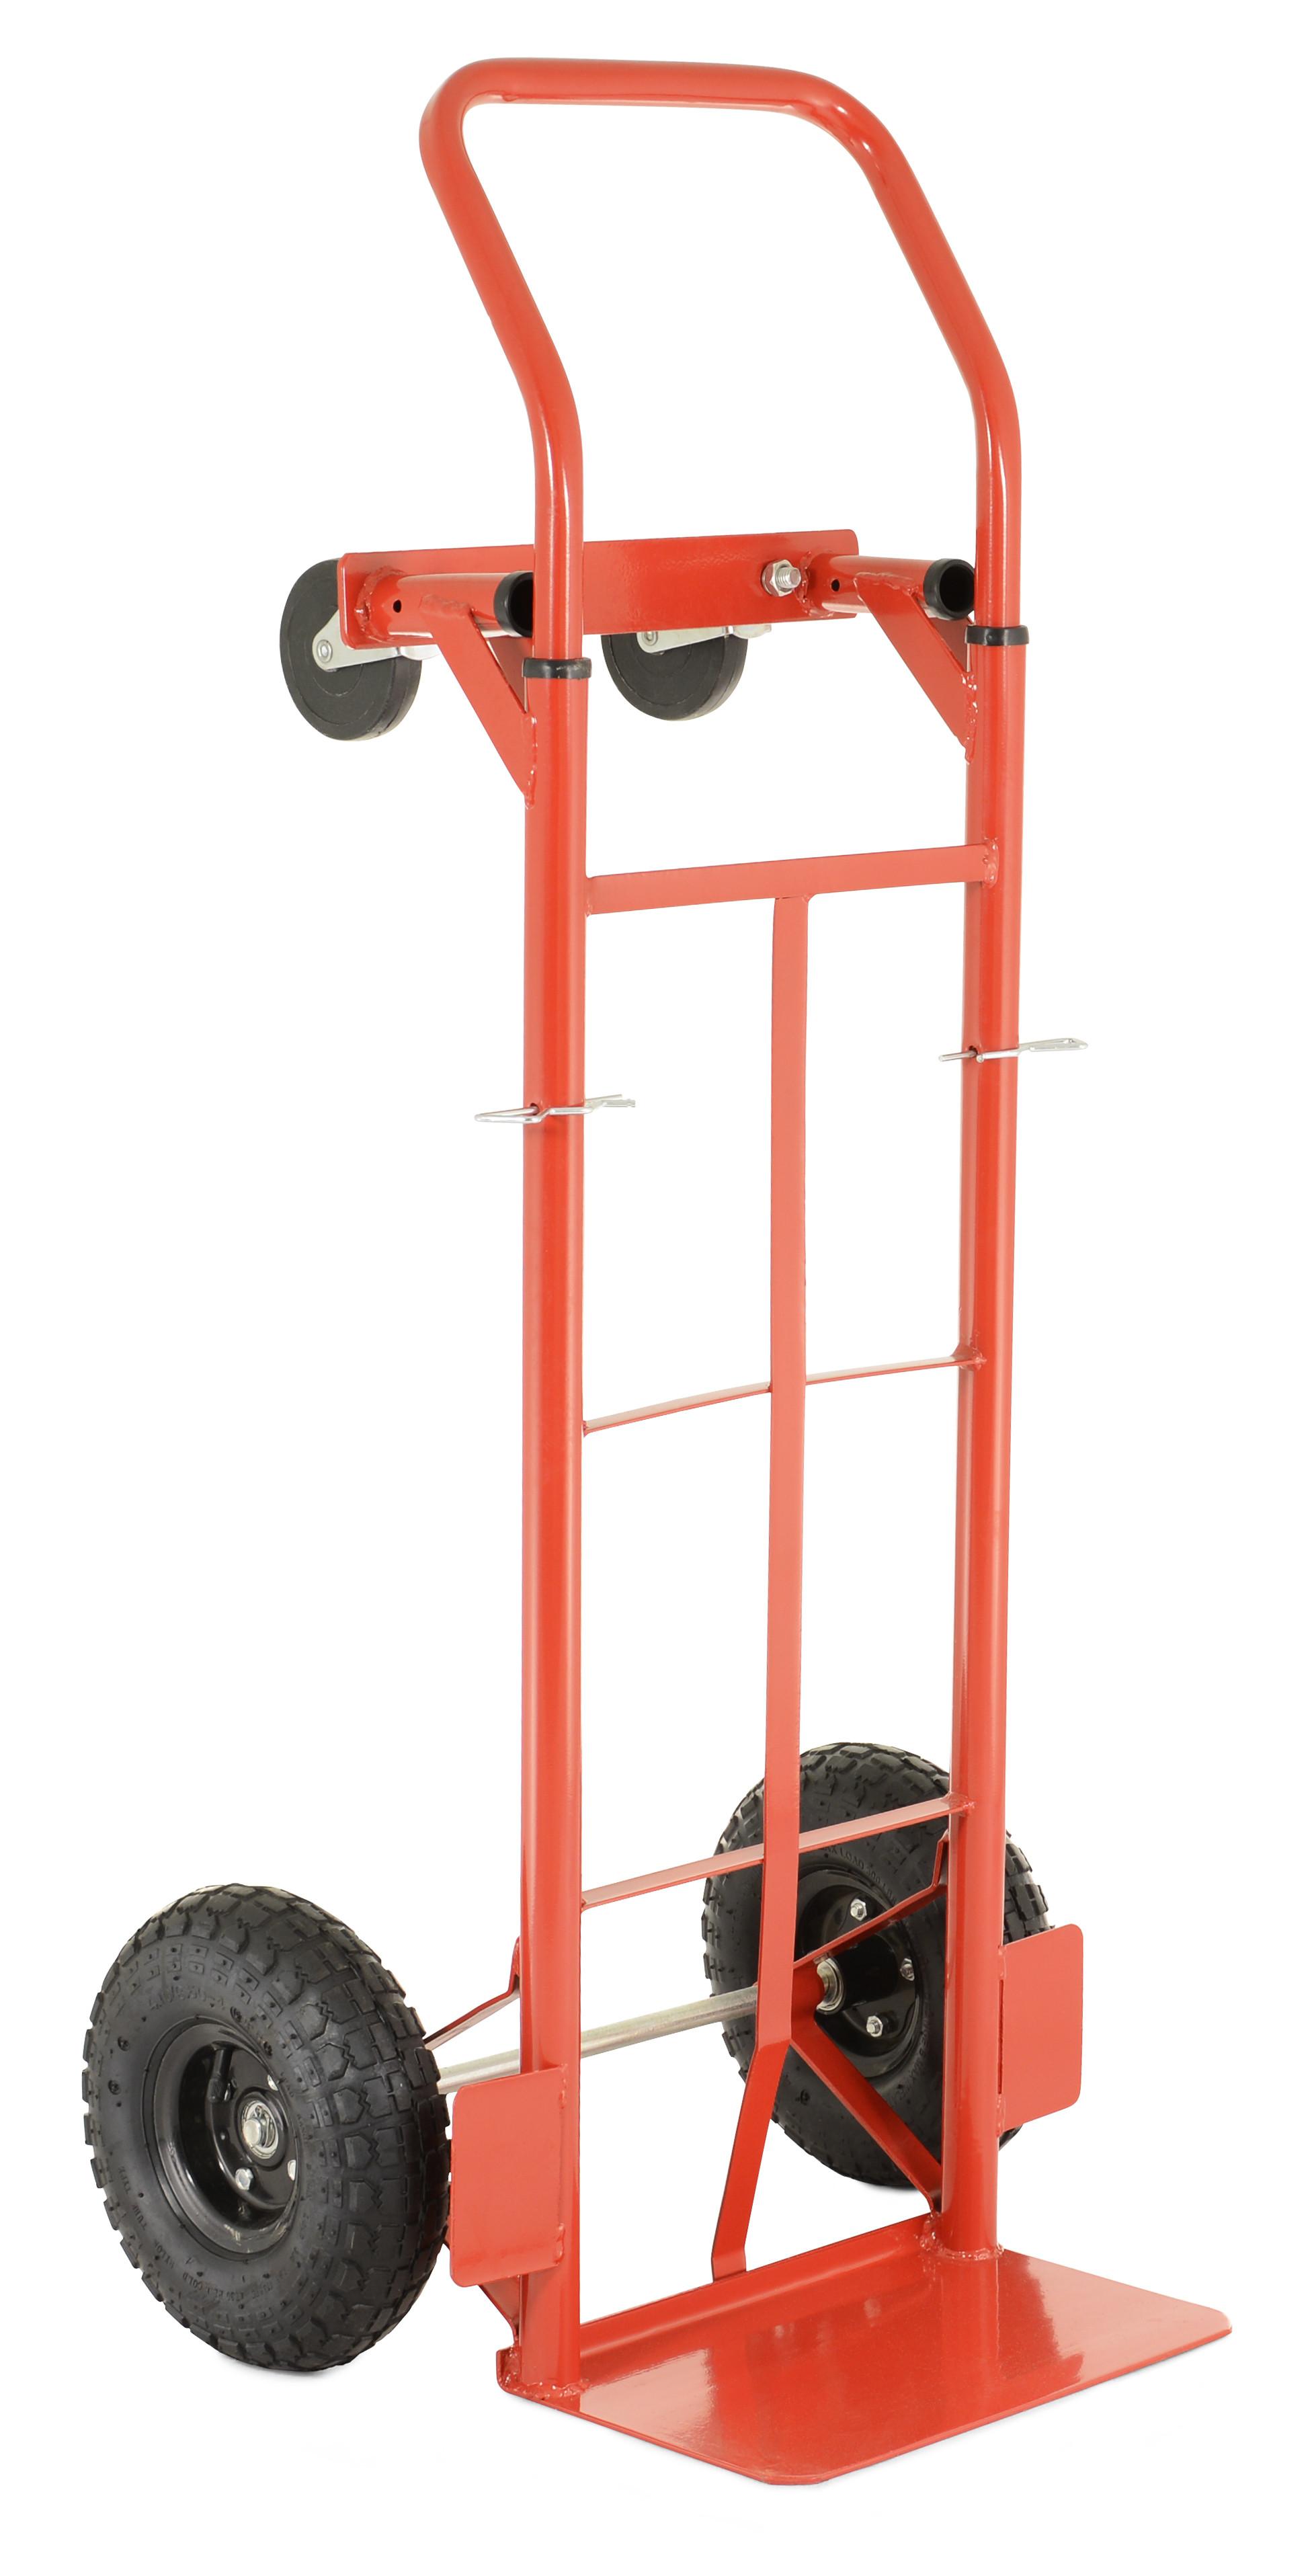 ST250 Sack Trolley